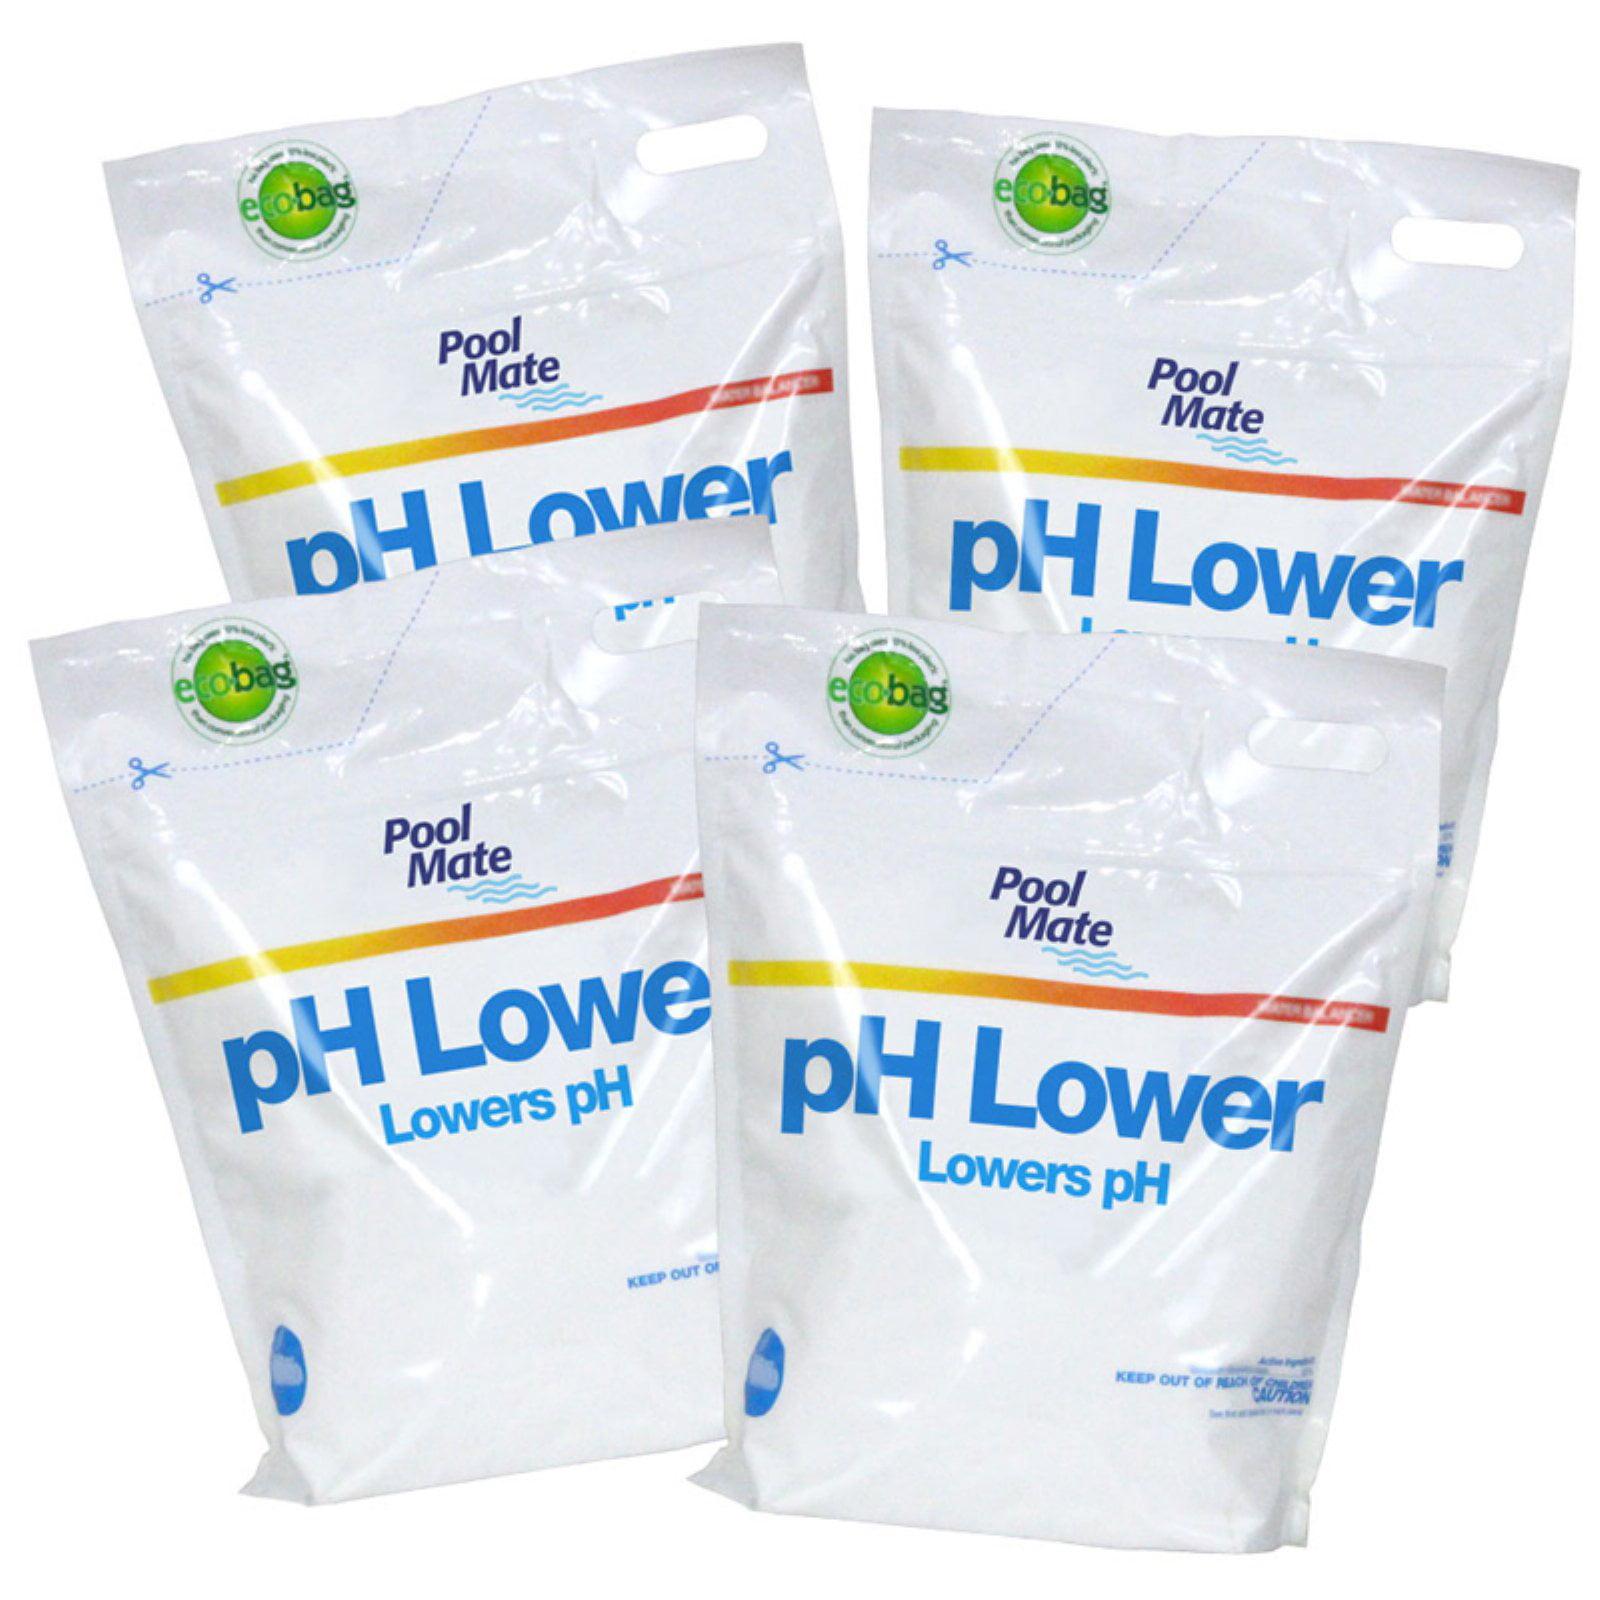 Pool Mate pH Lower for Swimming Pools